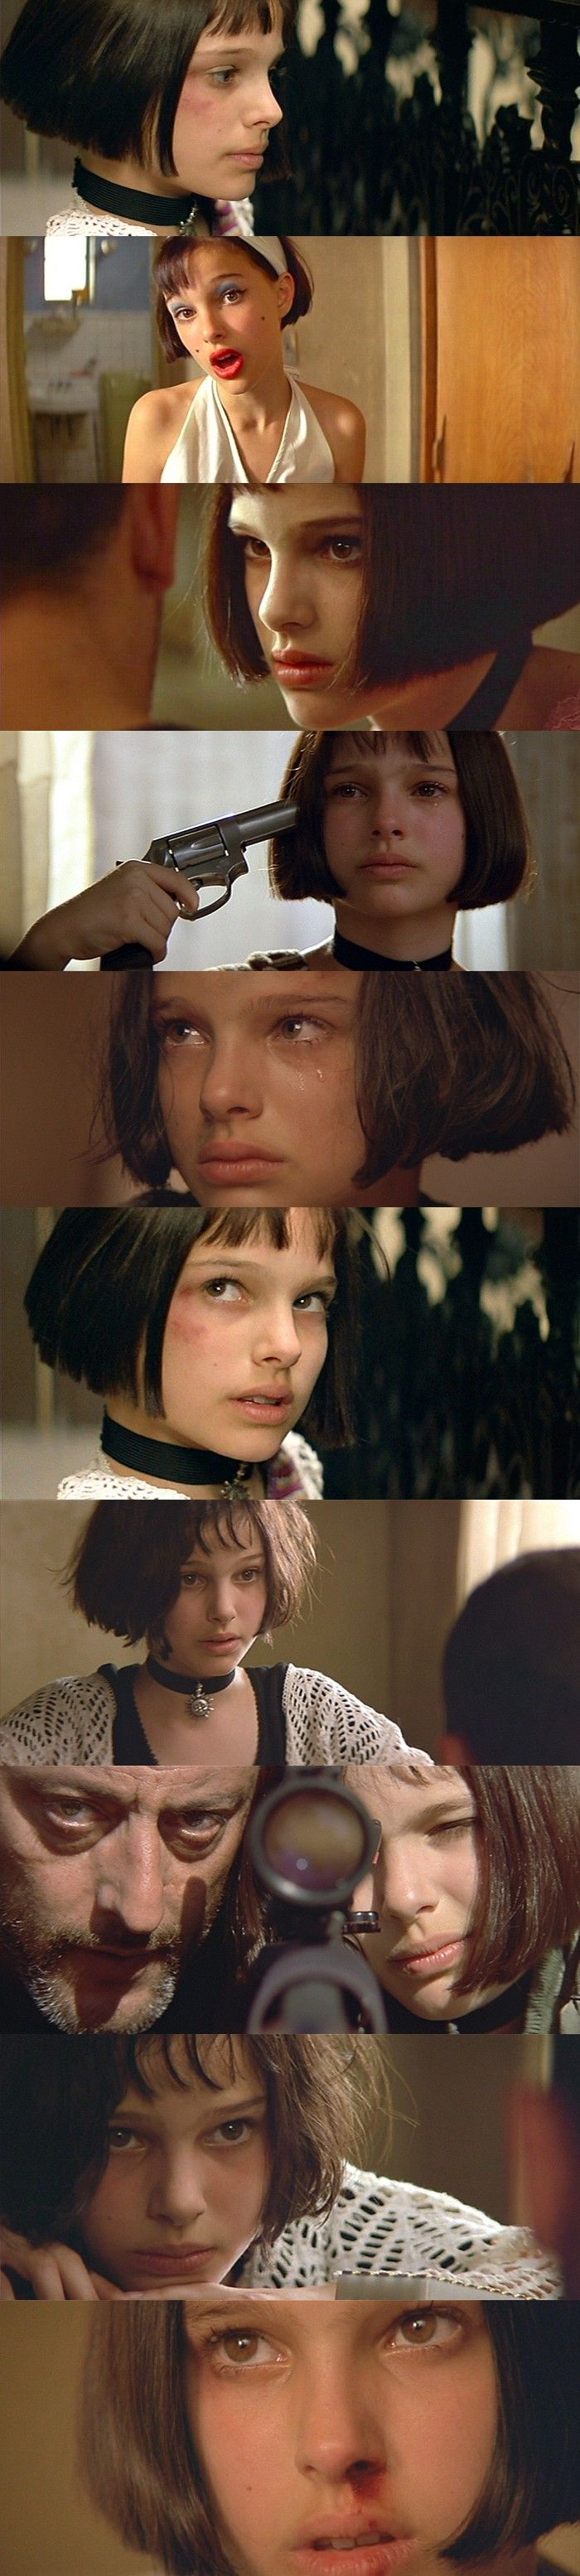 Leon Matilda < 레옹 >, 그리고 마틸다